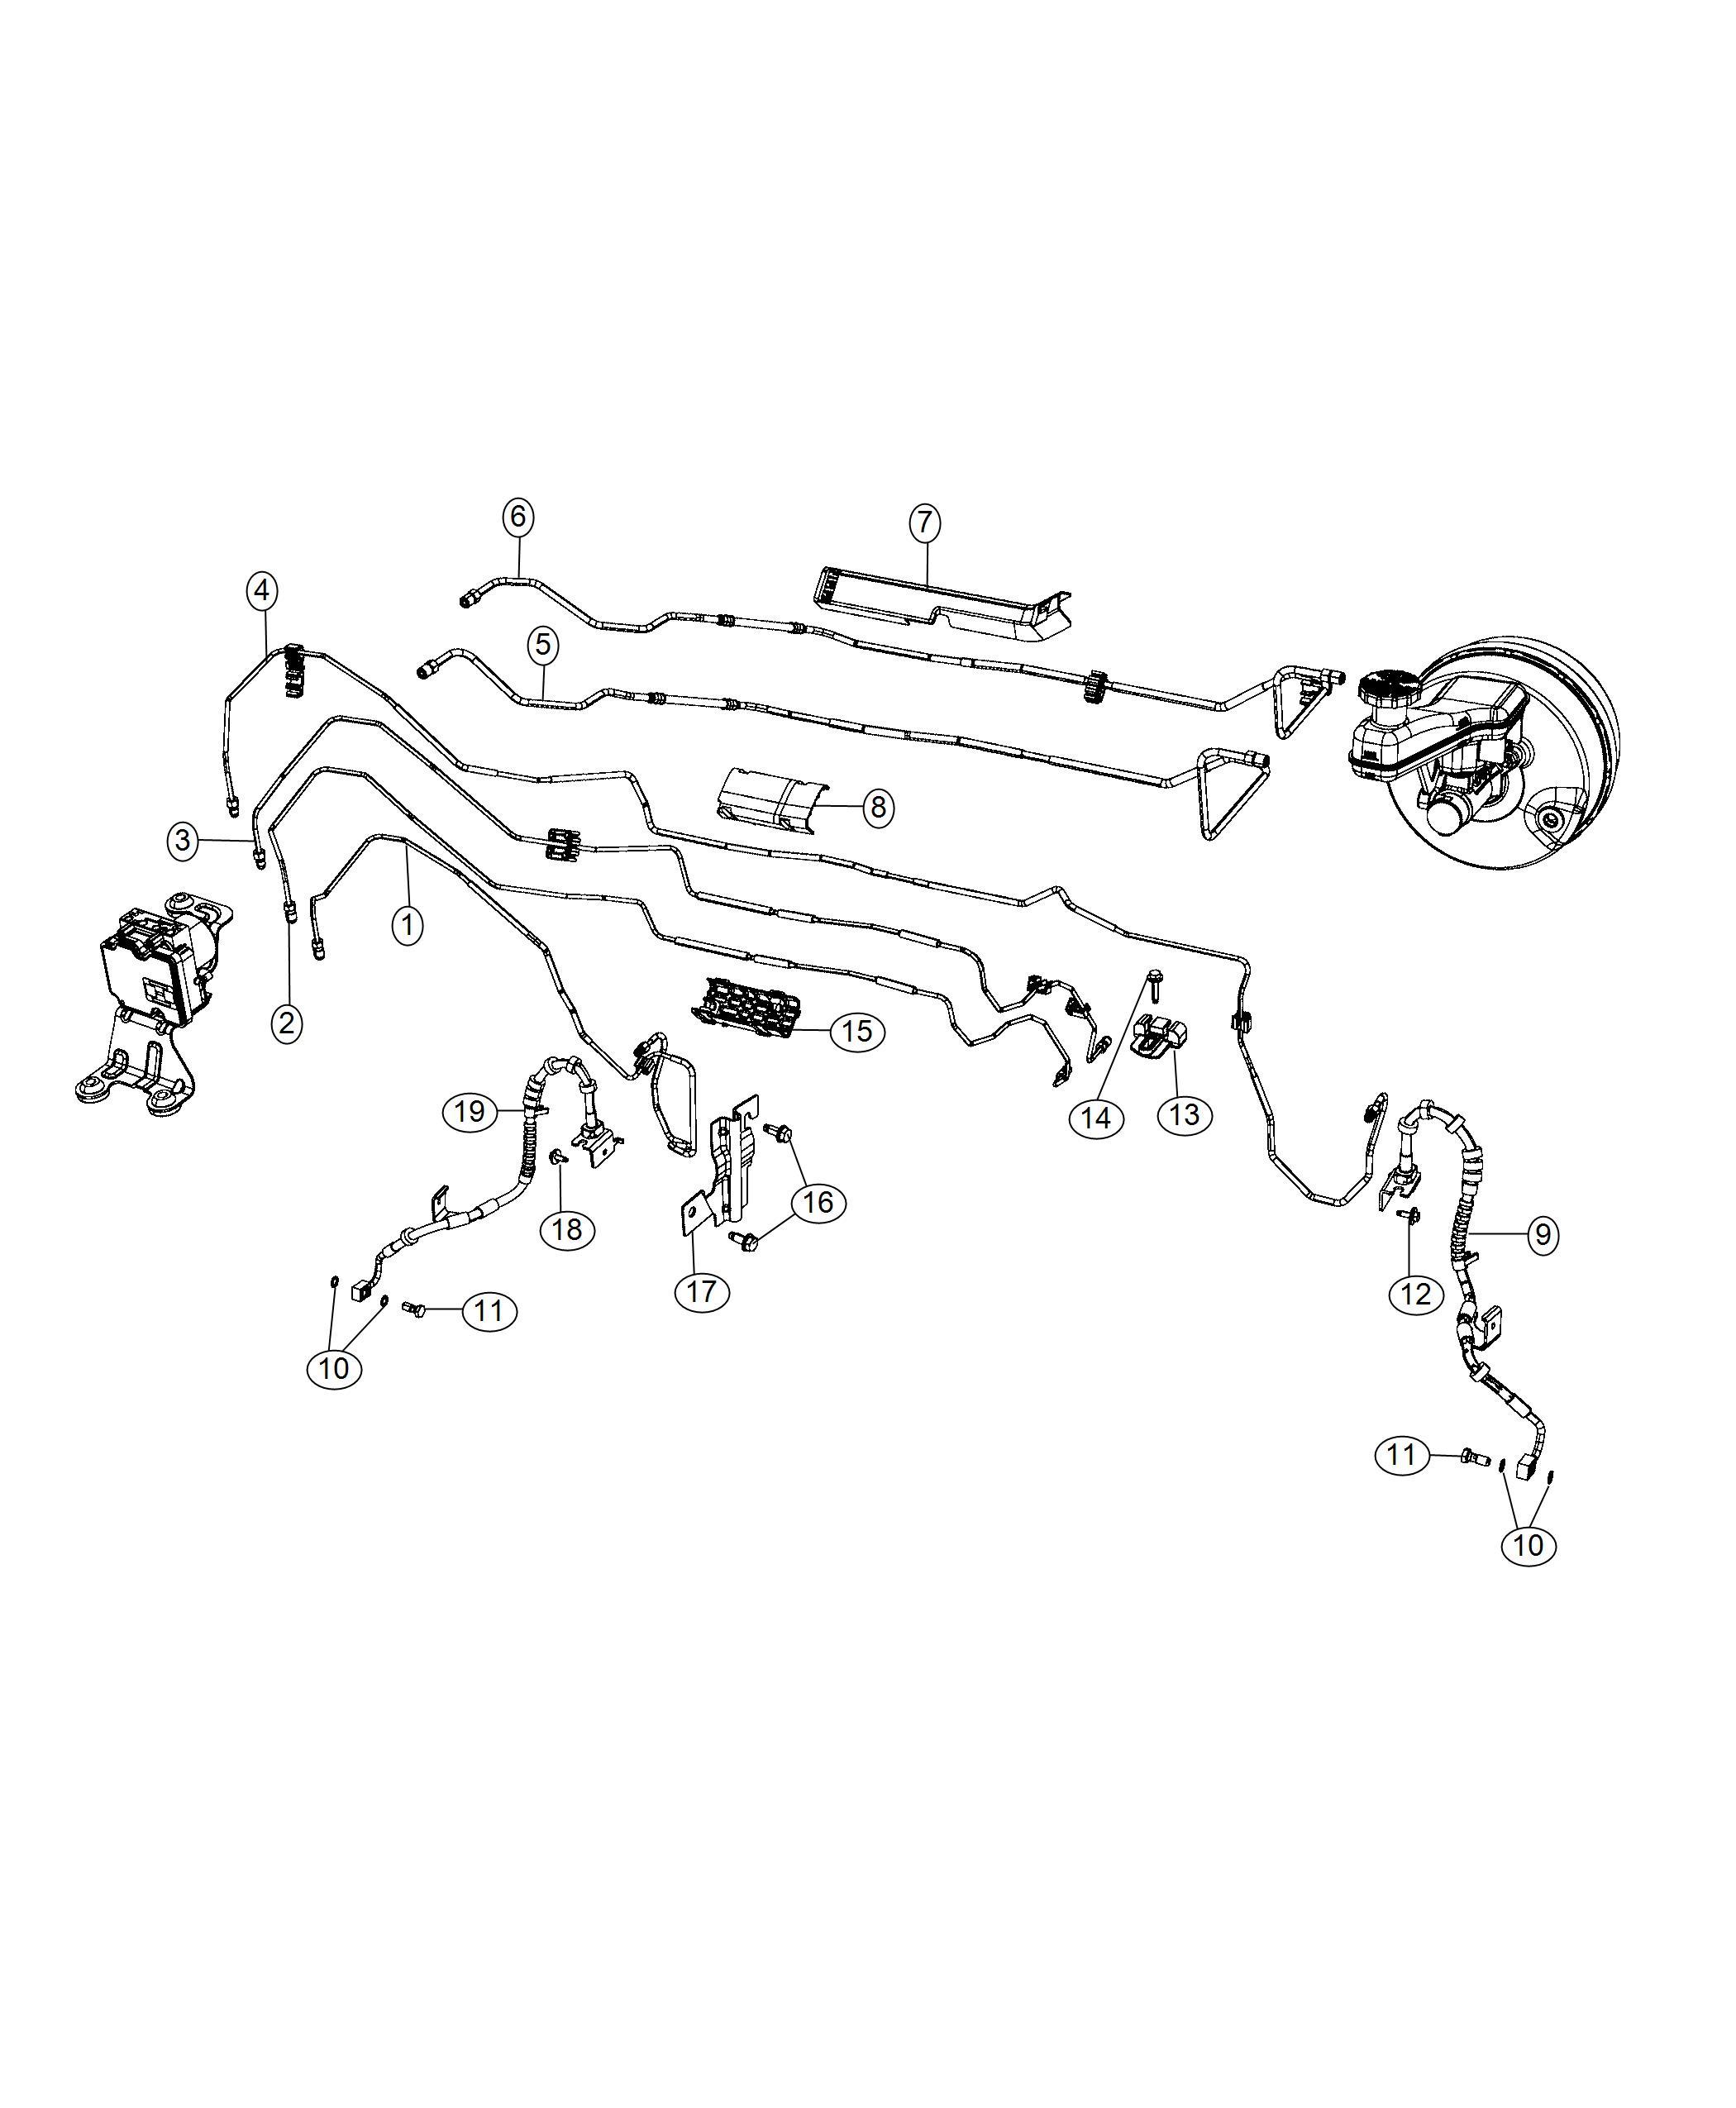 2019 Chrysler Pacifica Tube. Brake. Primary. [anti-lock 4